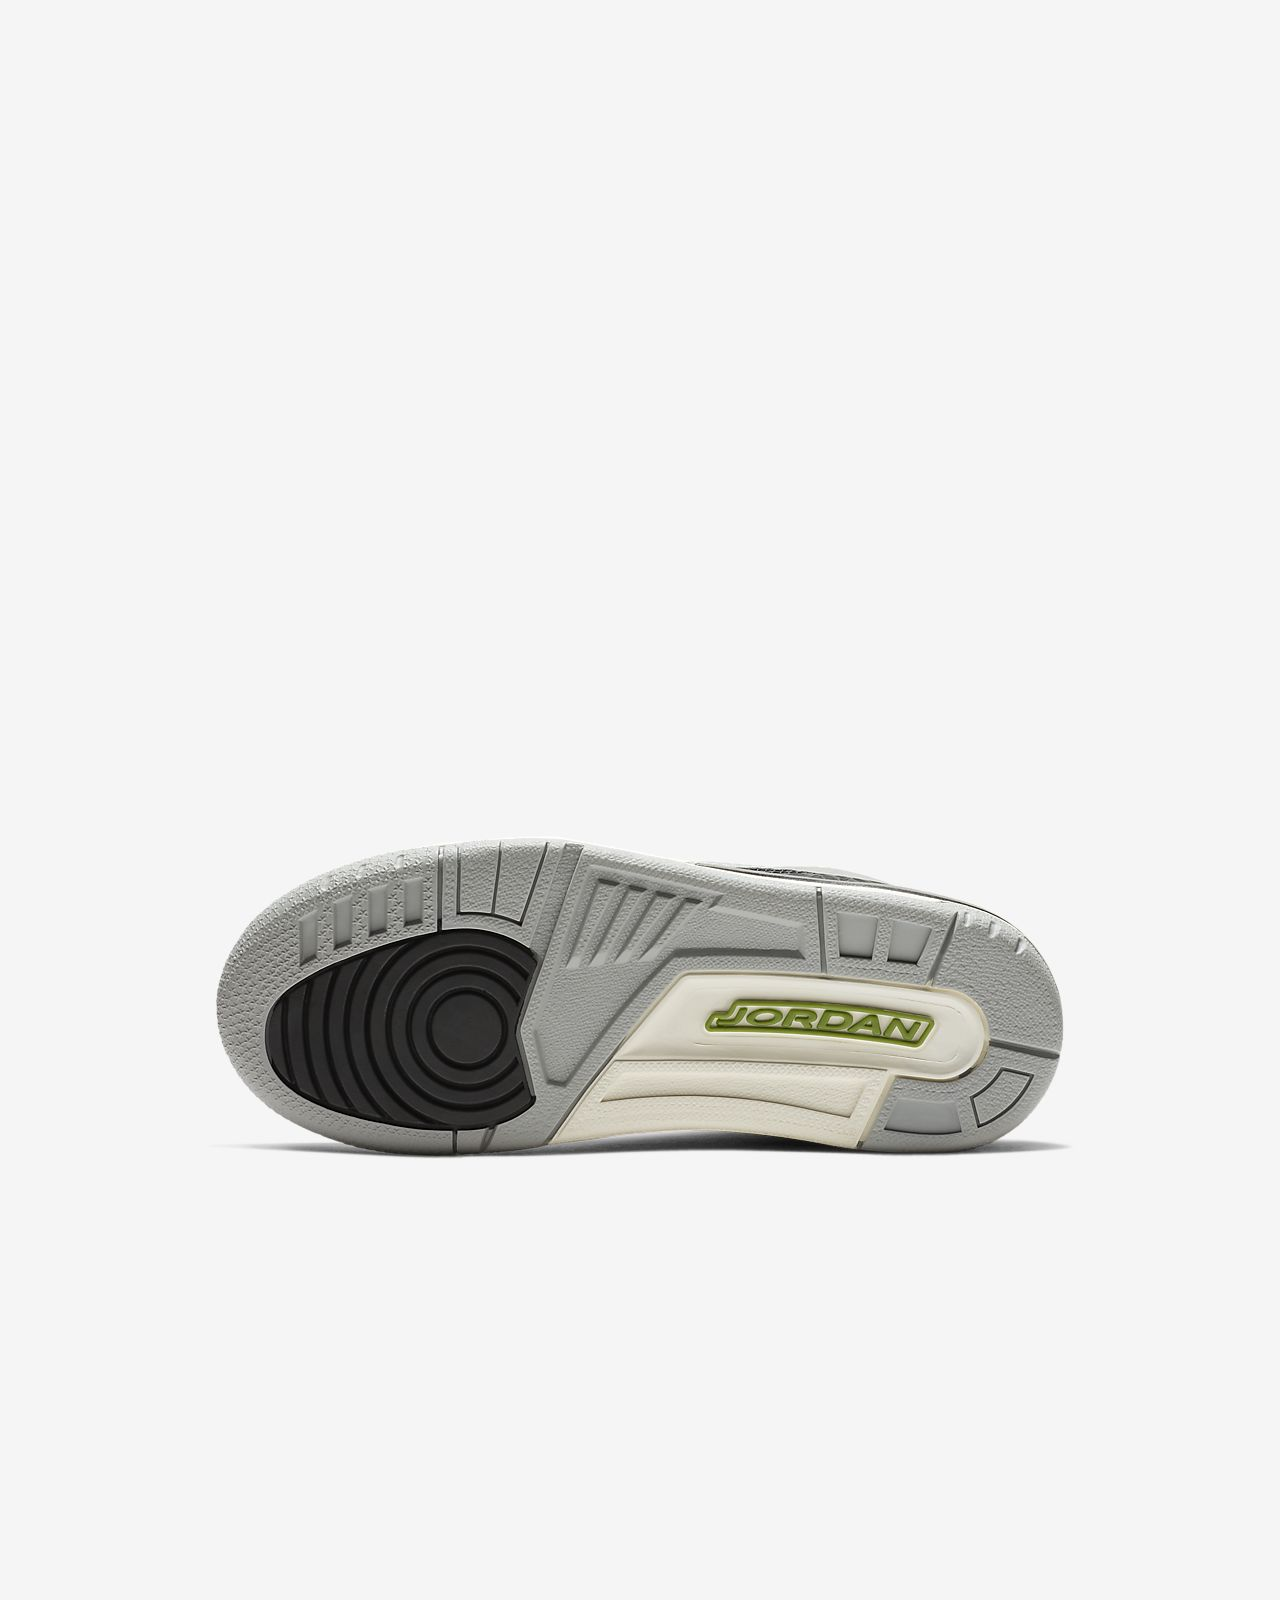 online store 210bf f5cb4 ... Air Jordan Retro 3 Younger Kids  Shoe